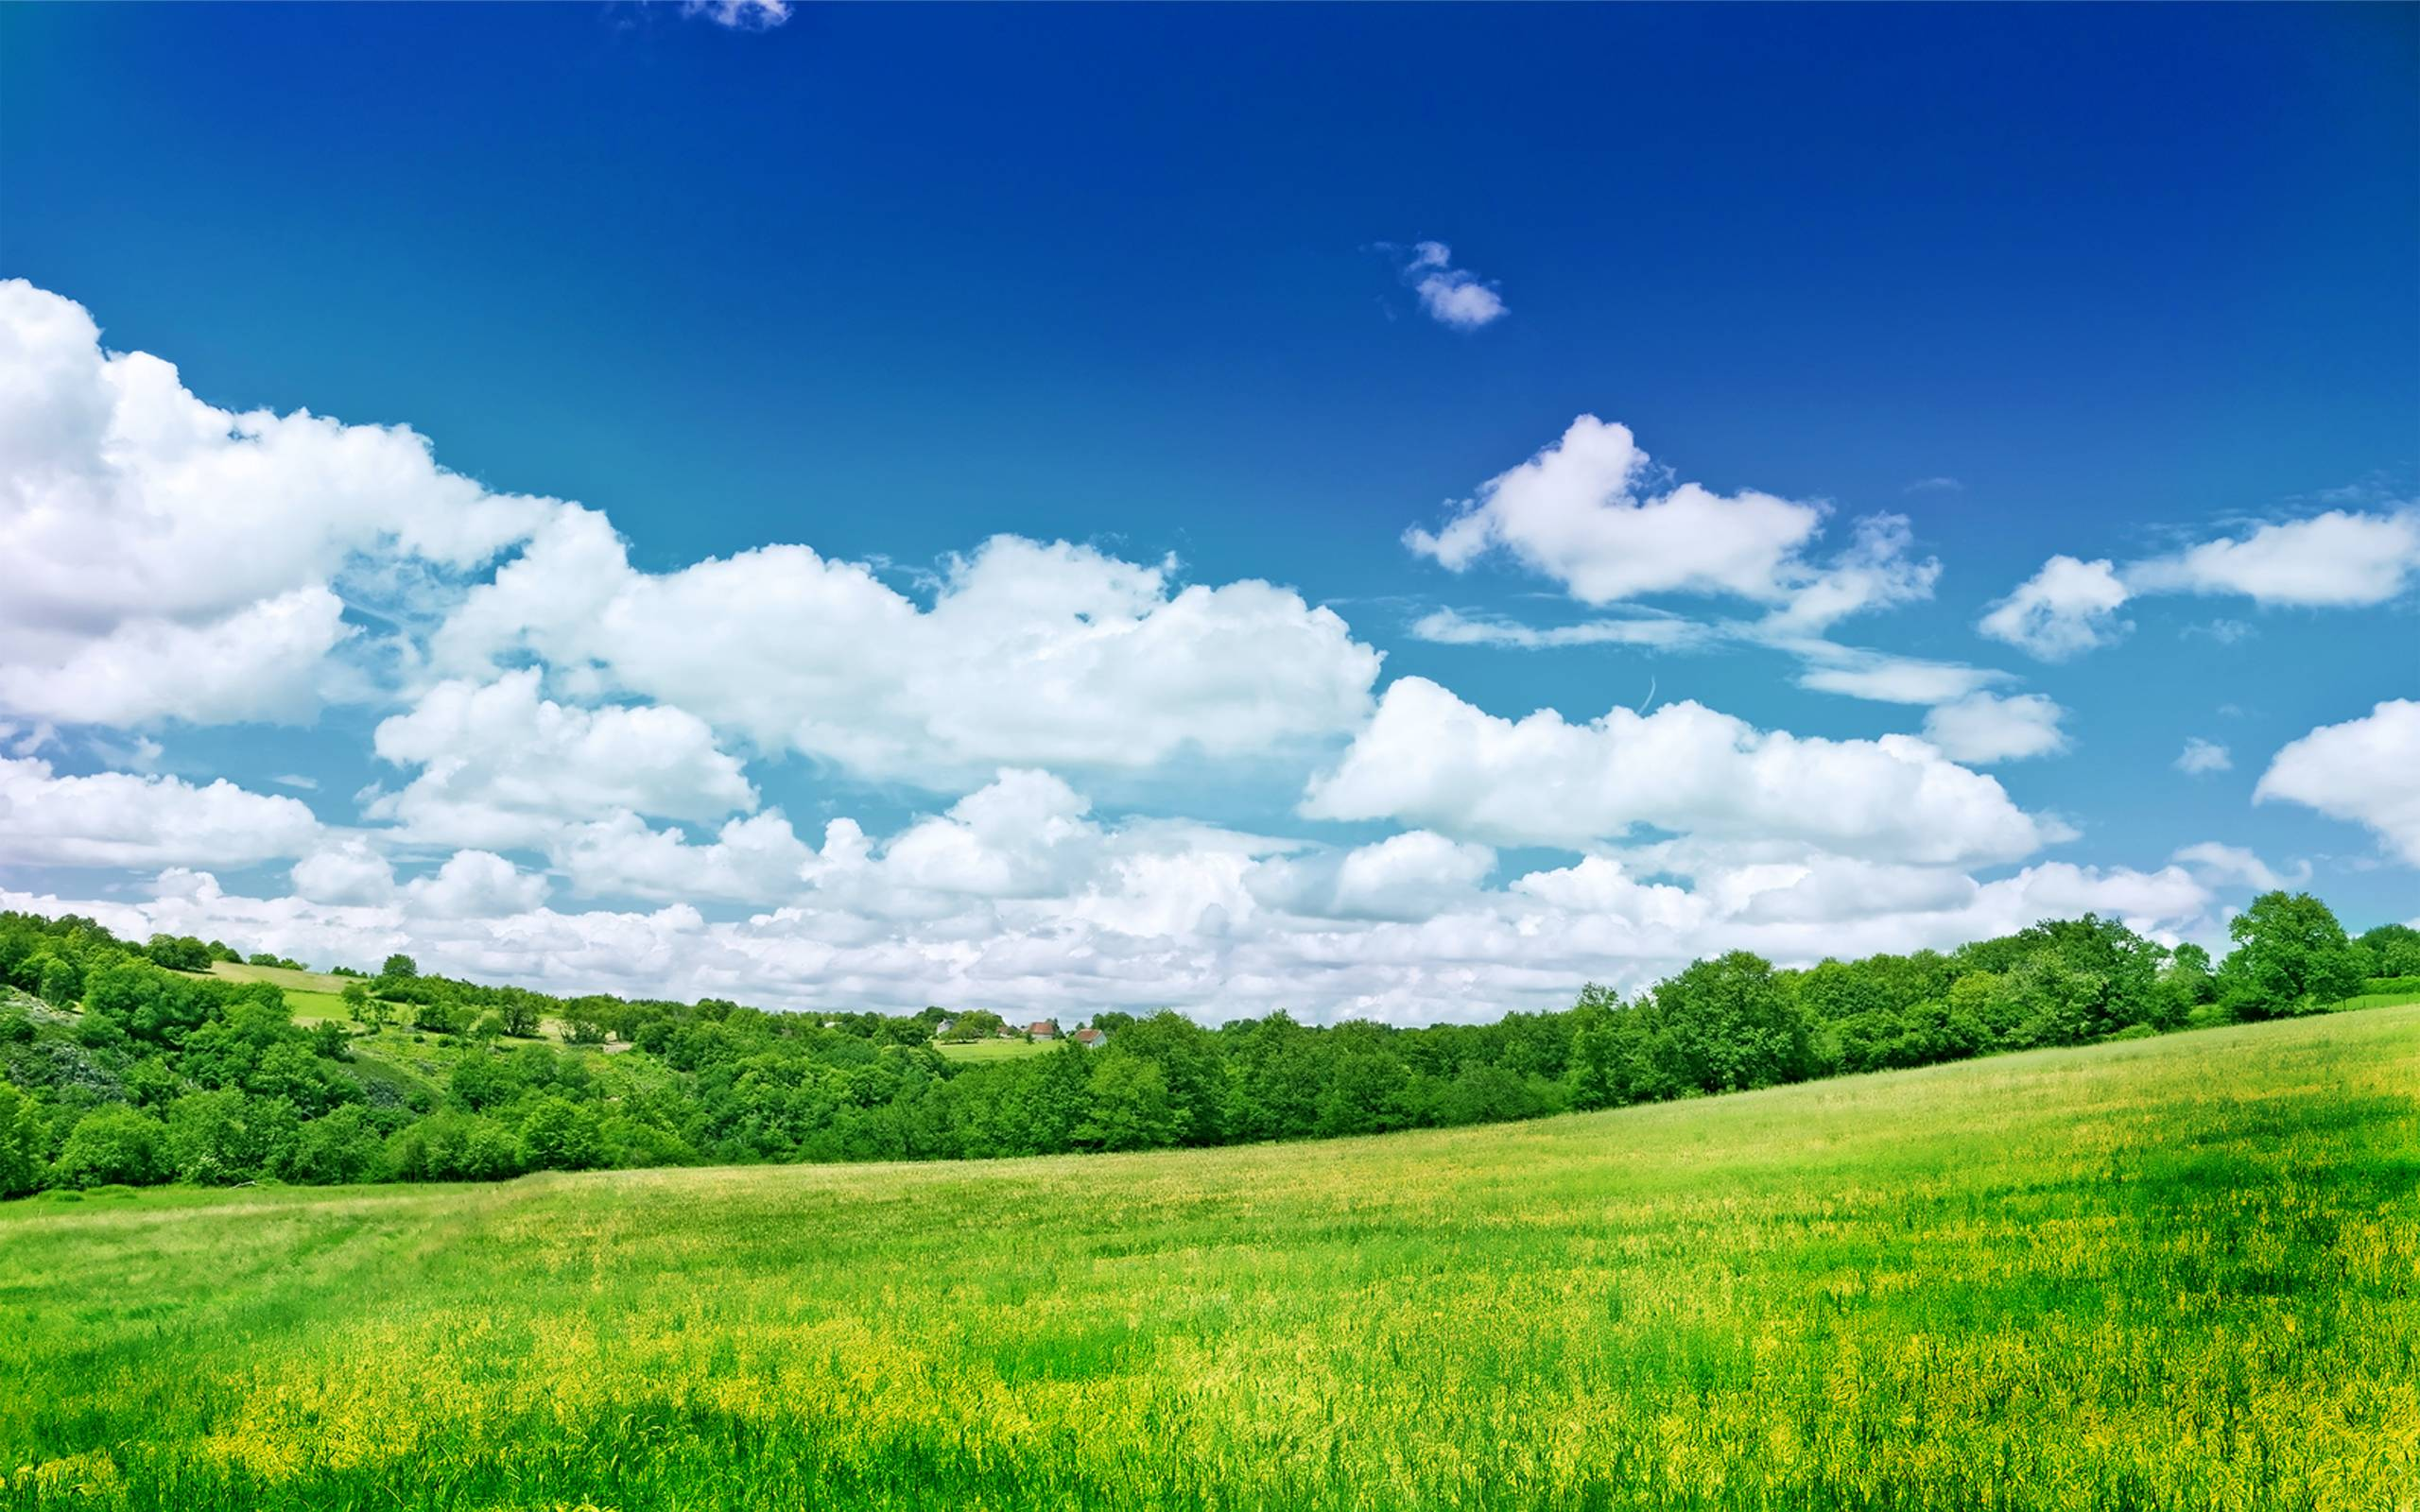 Big Beautiful Nature Wallpapers Top Free Big Beautiful